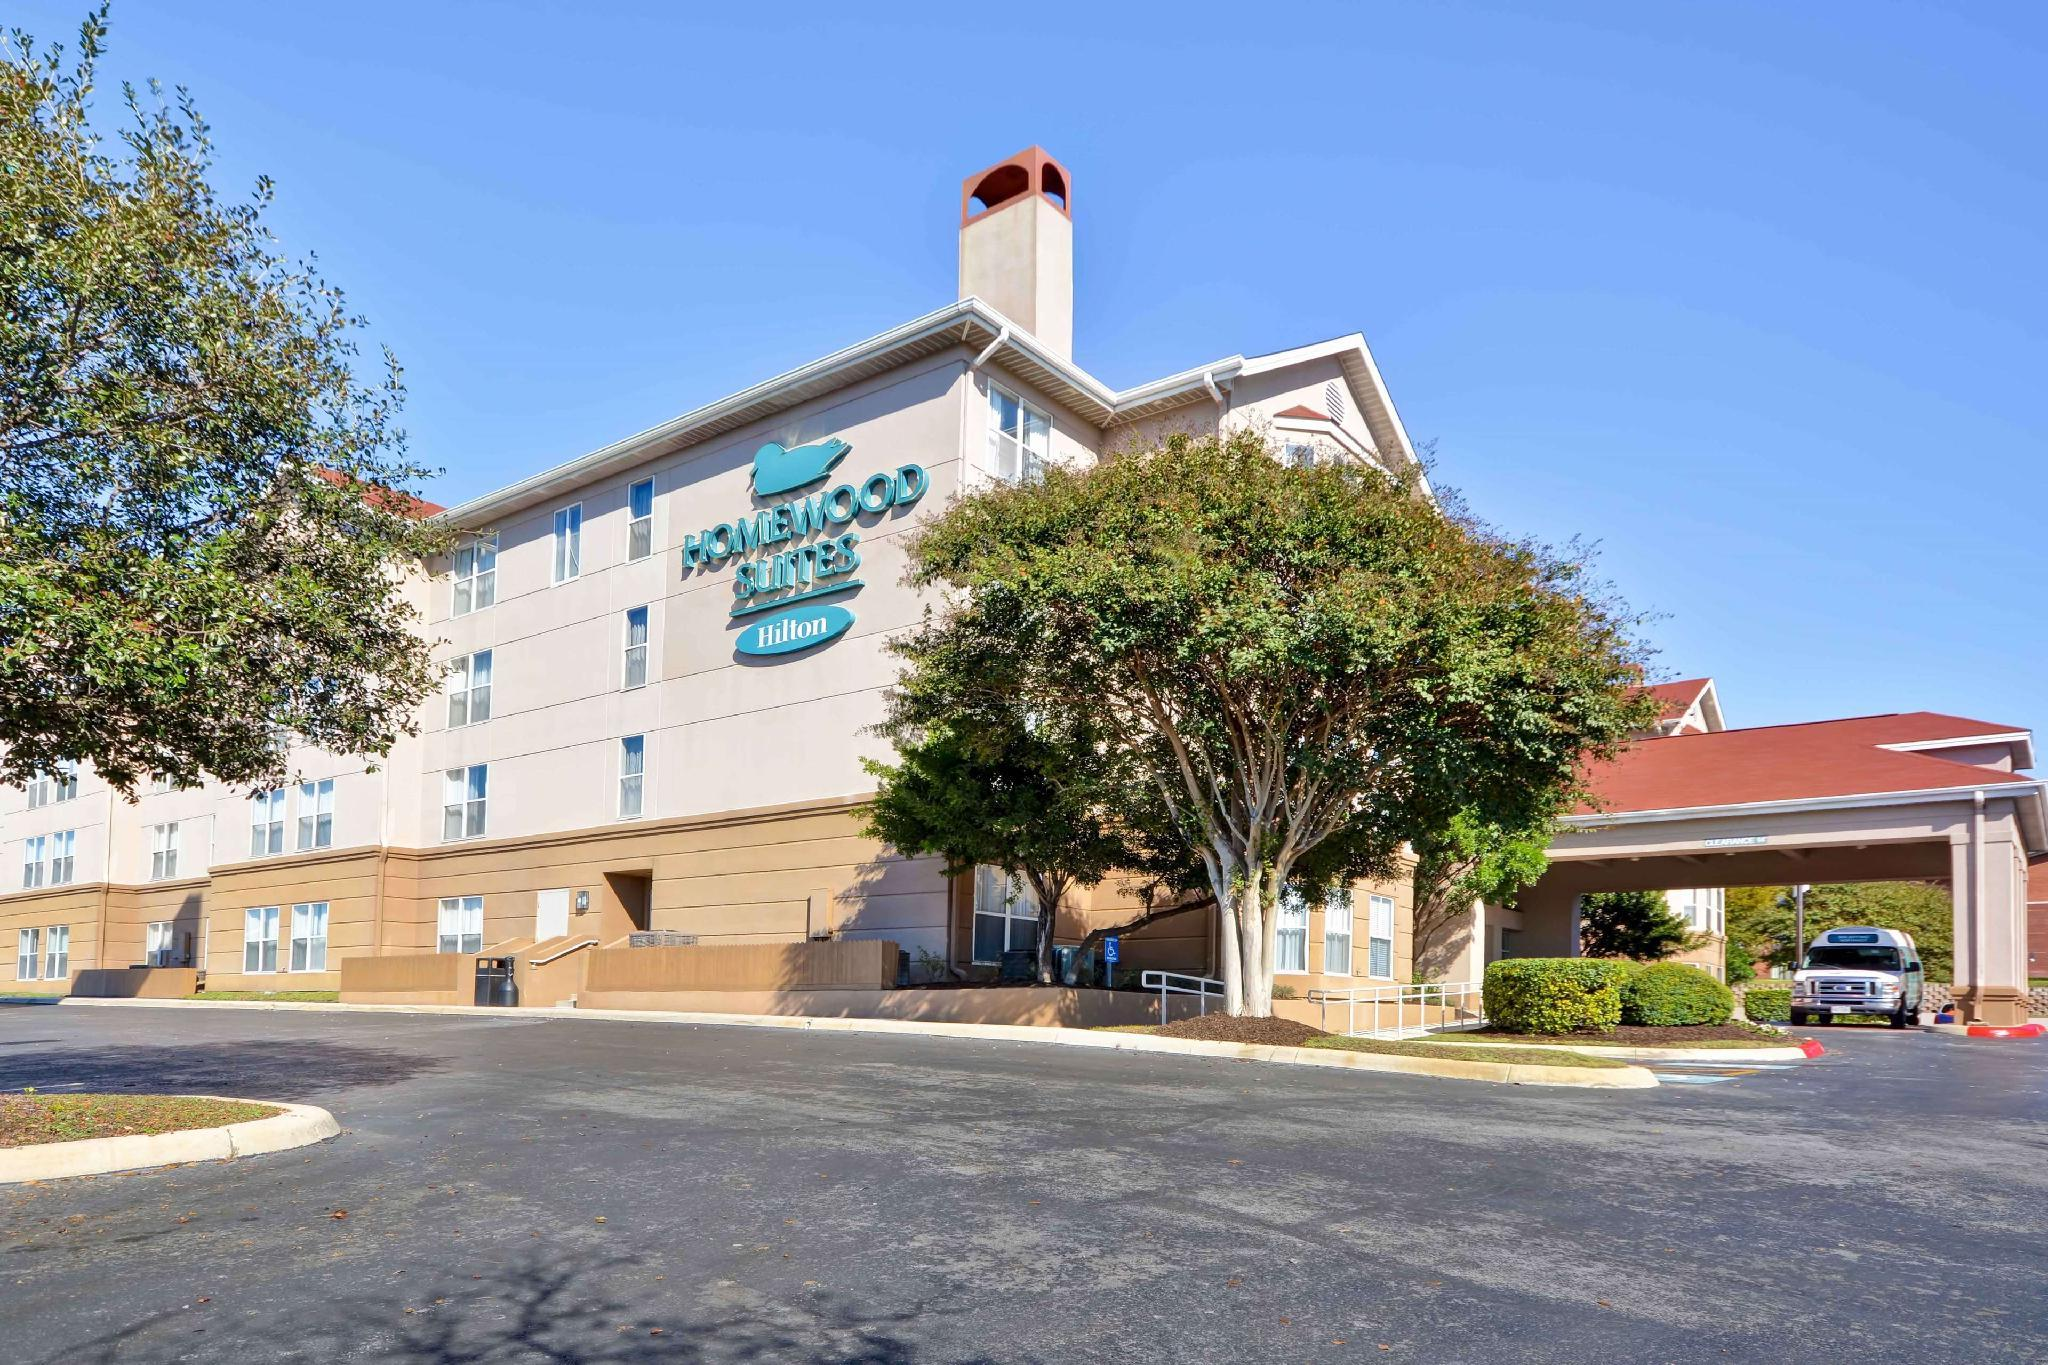 Homewood Suites By Hilton San Antonio Northwest Hotel